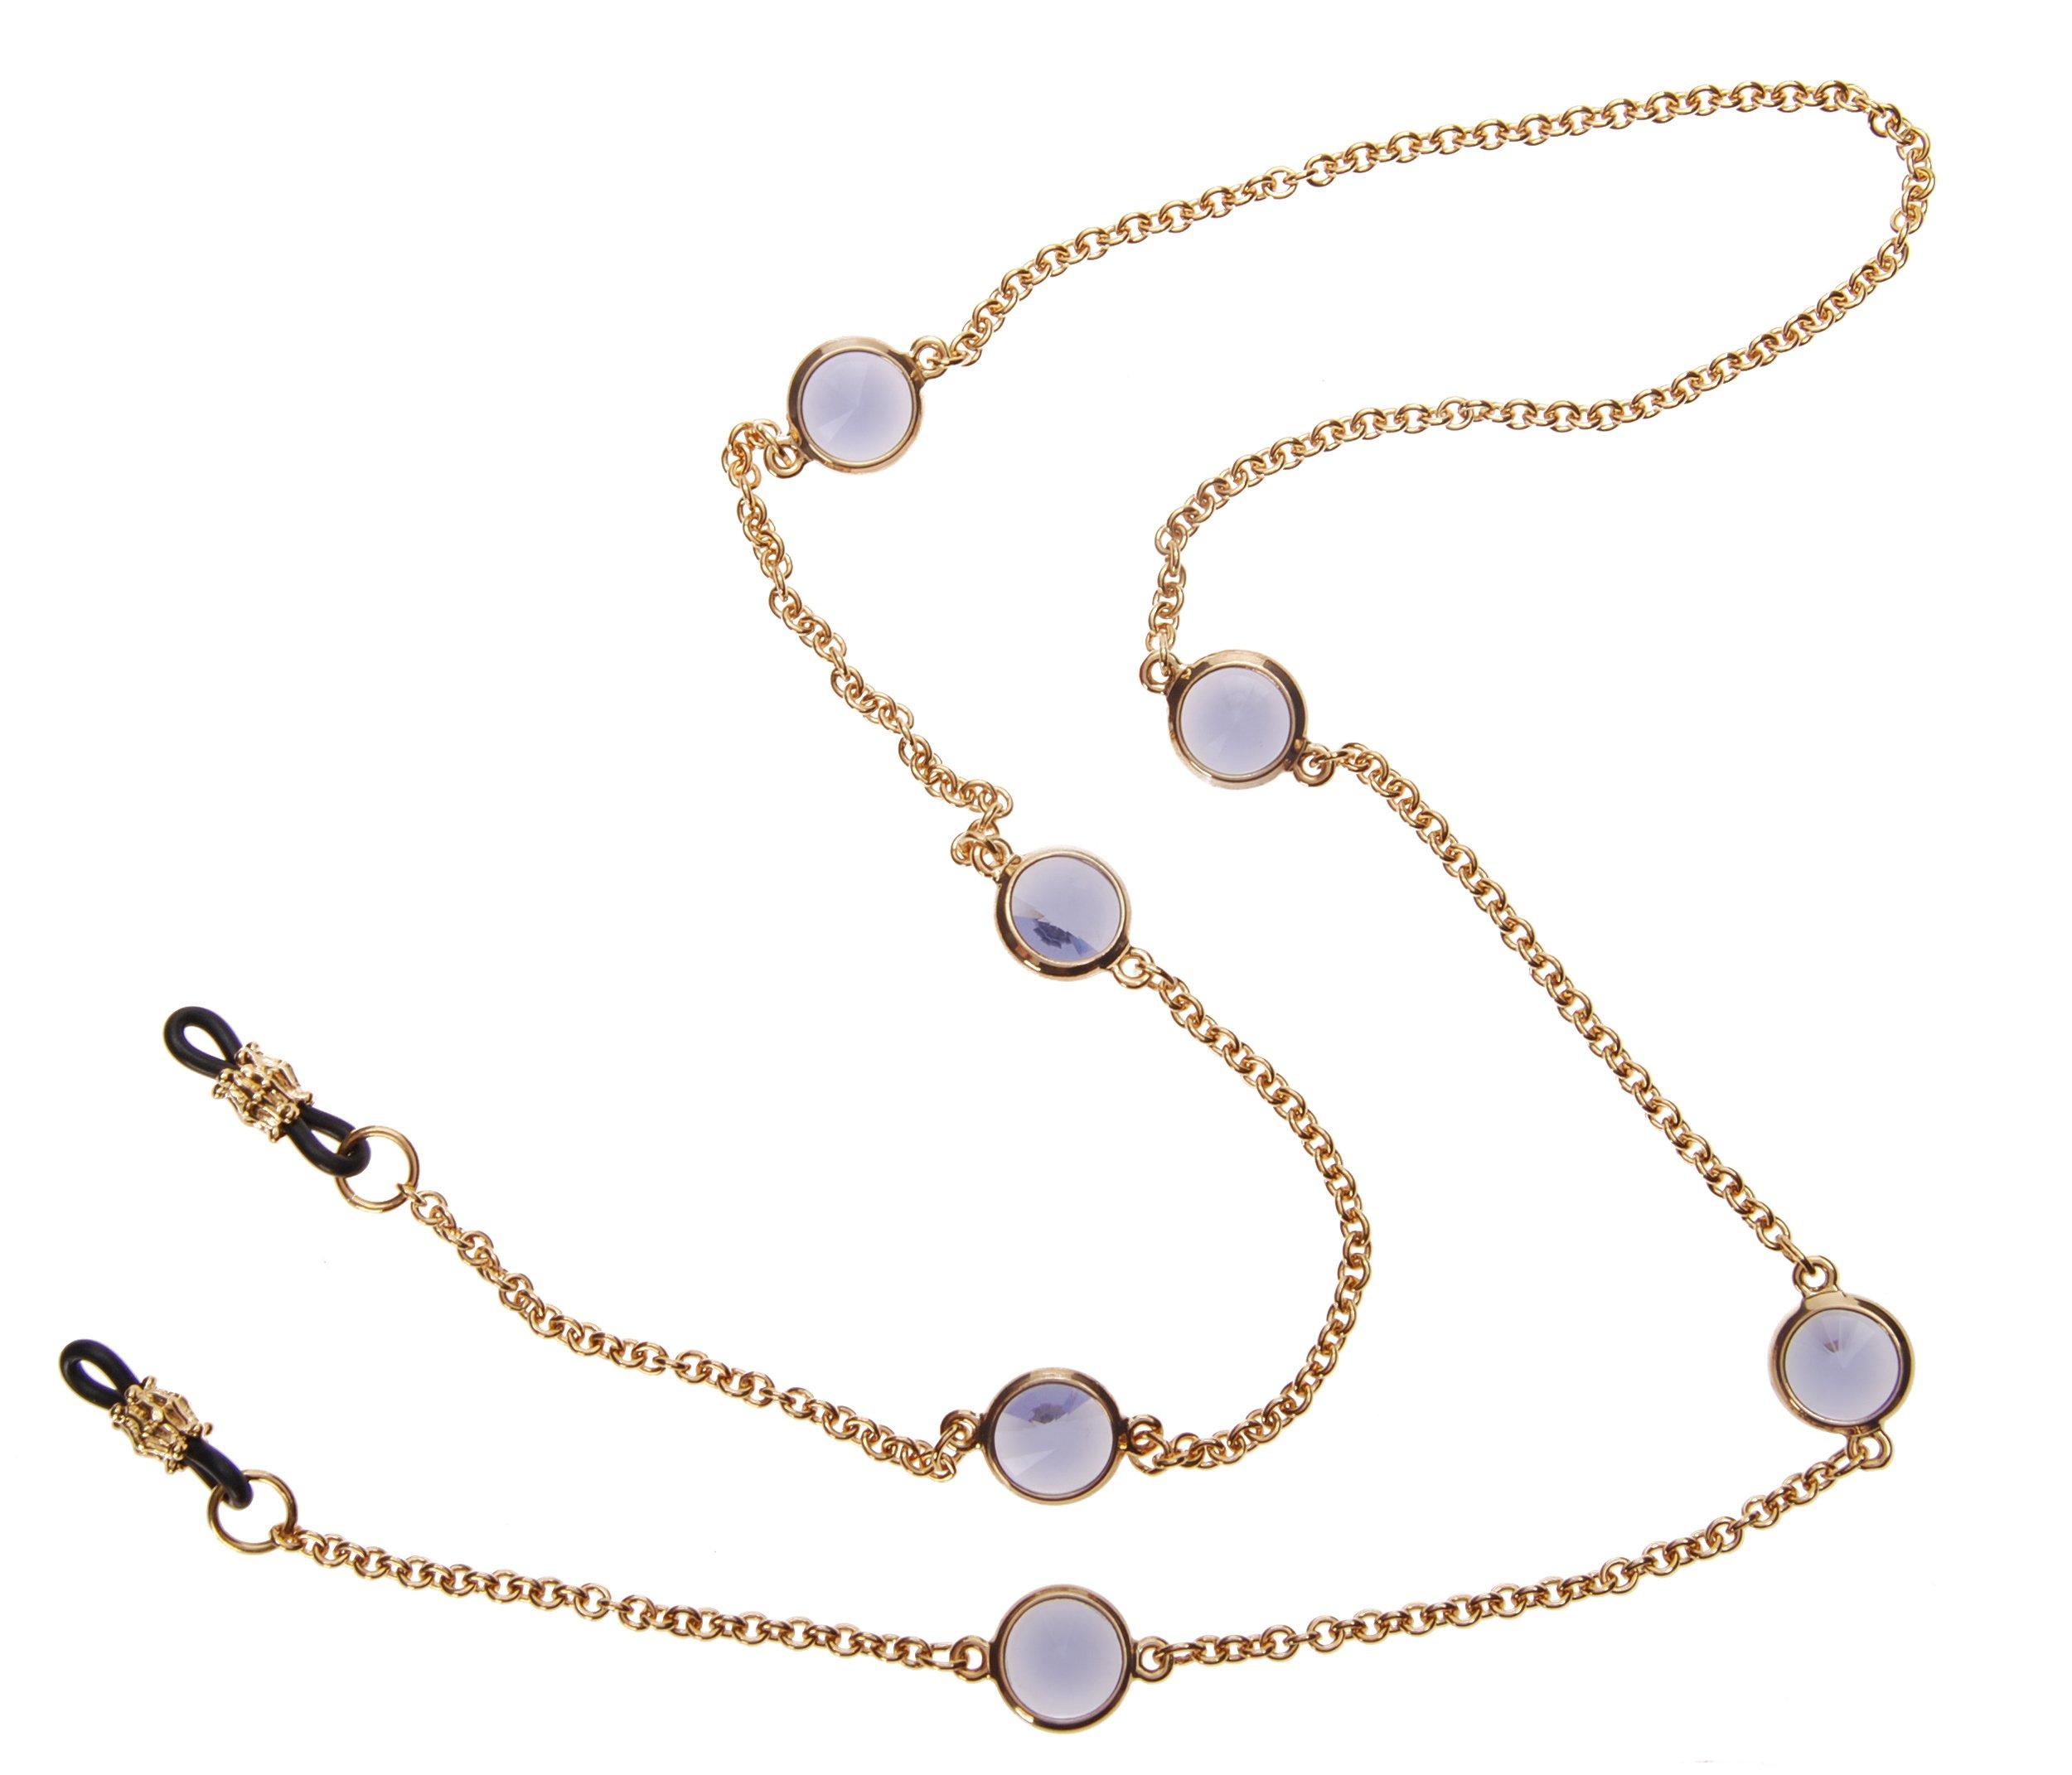 L. Erickson Charmer Eyeglass Chain - Tanzanite/Gold by L. Erickson